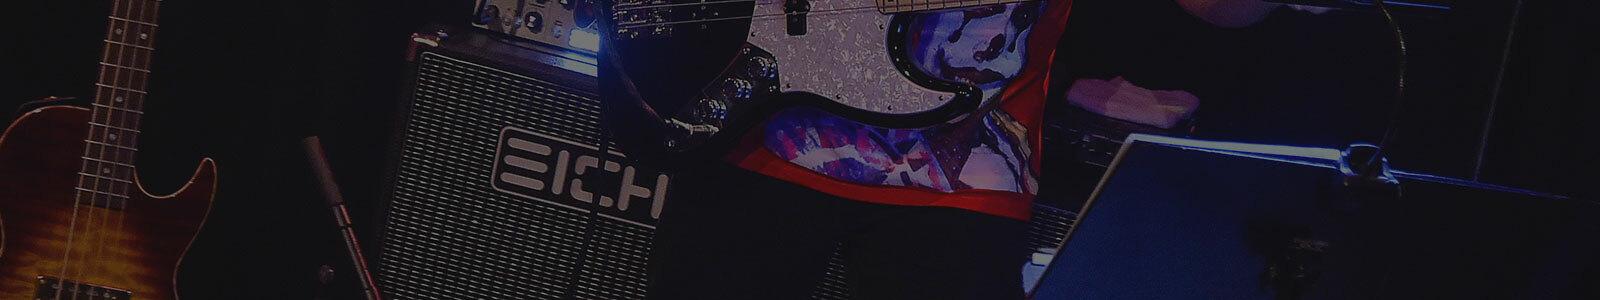 Eich Live Performance Bass